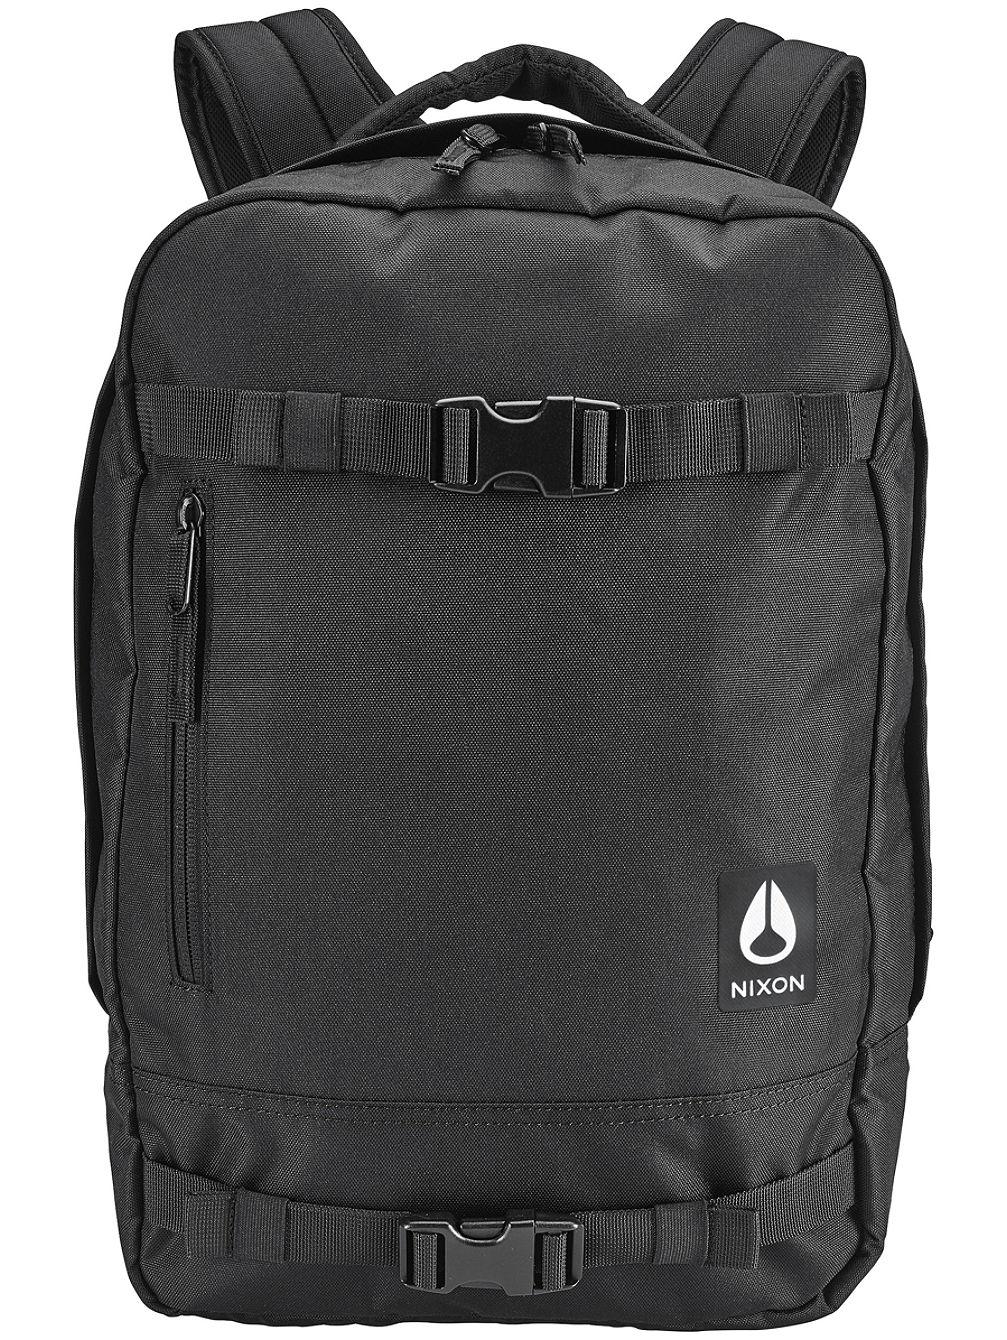 44140da7b5b6f0 Buy Nixon Del Mar II Backpack online at Blue Tomato